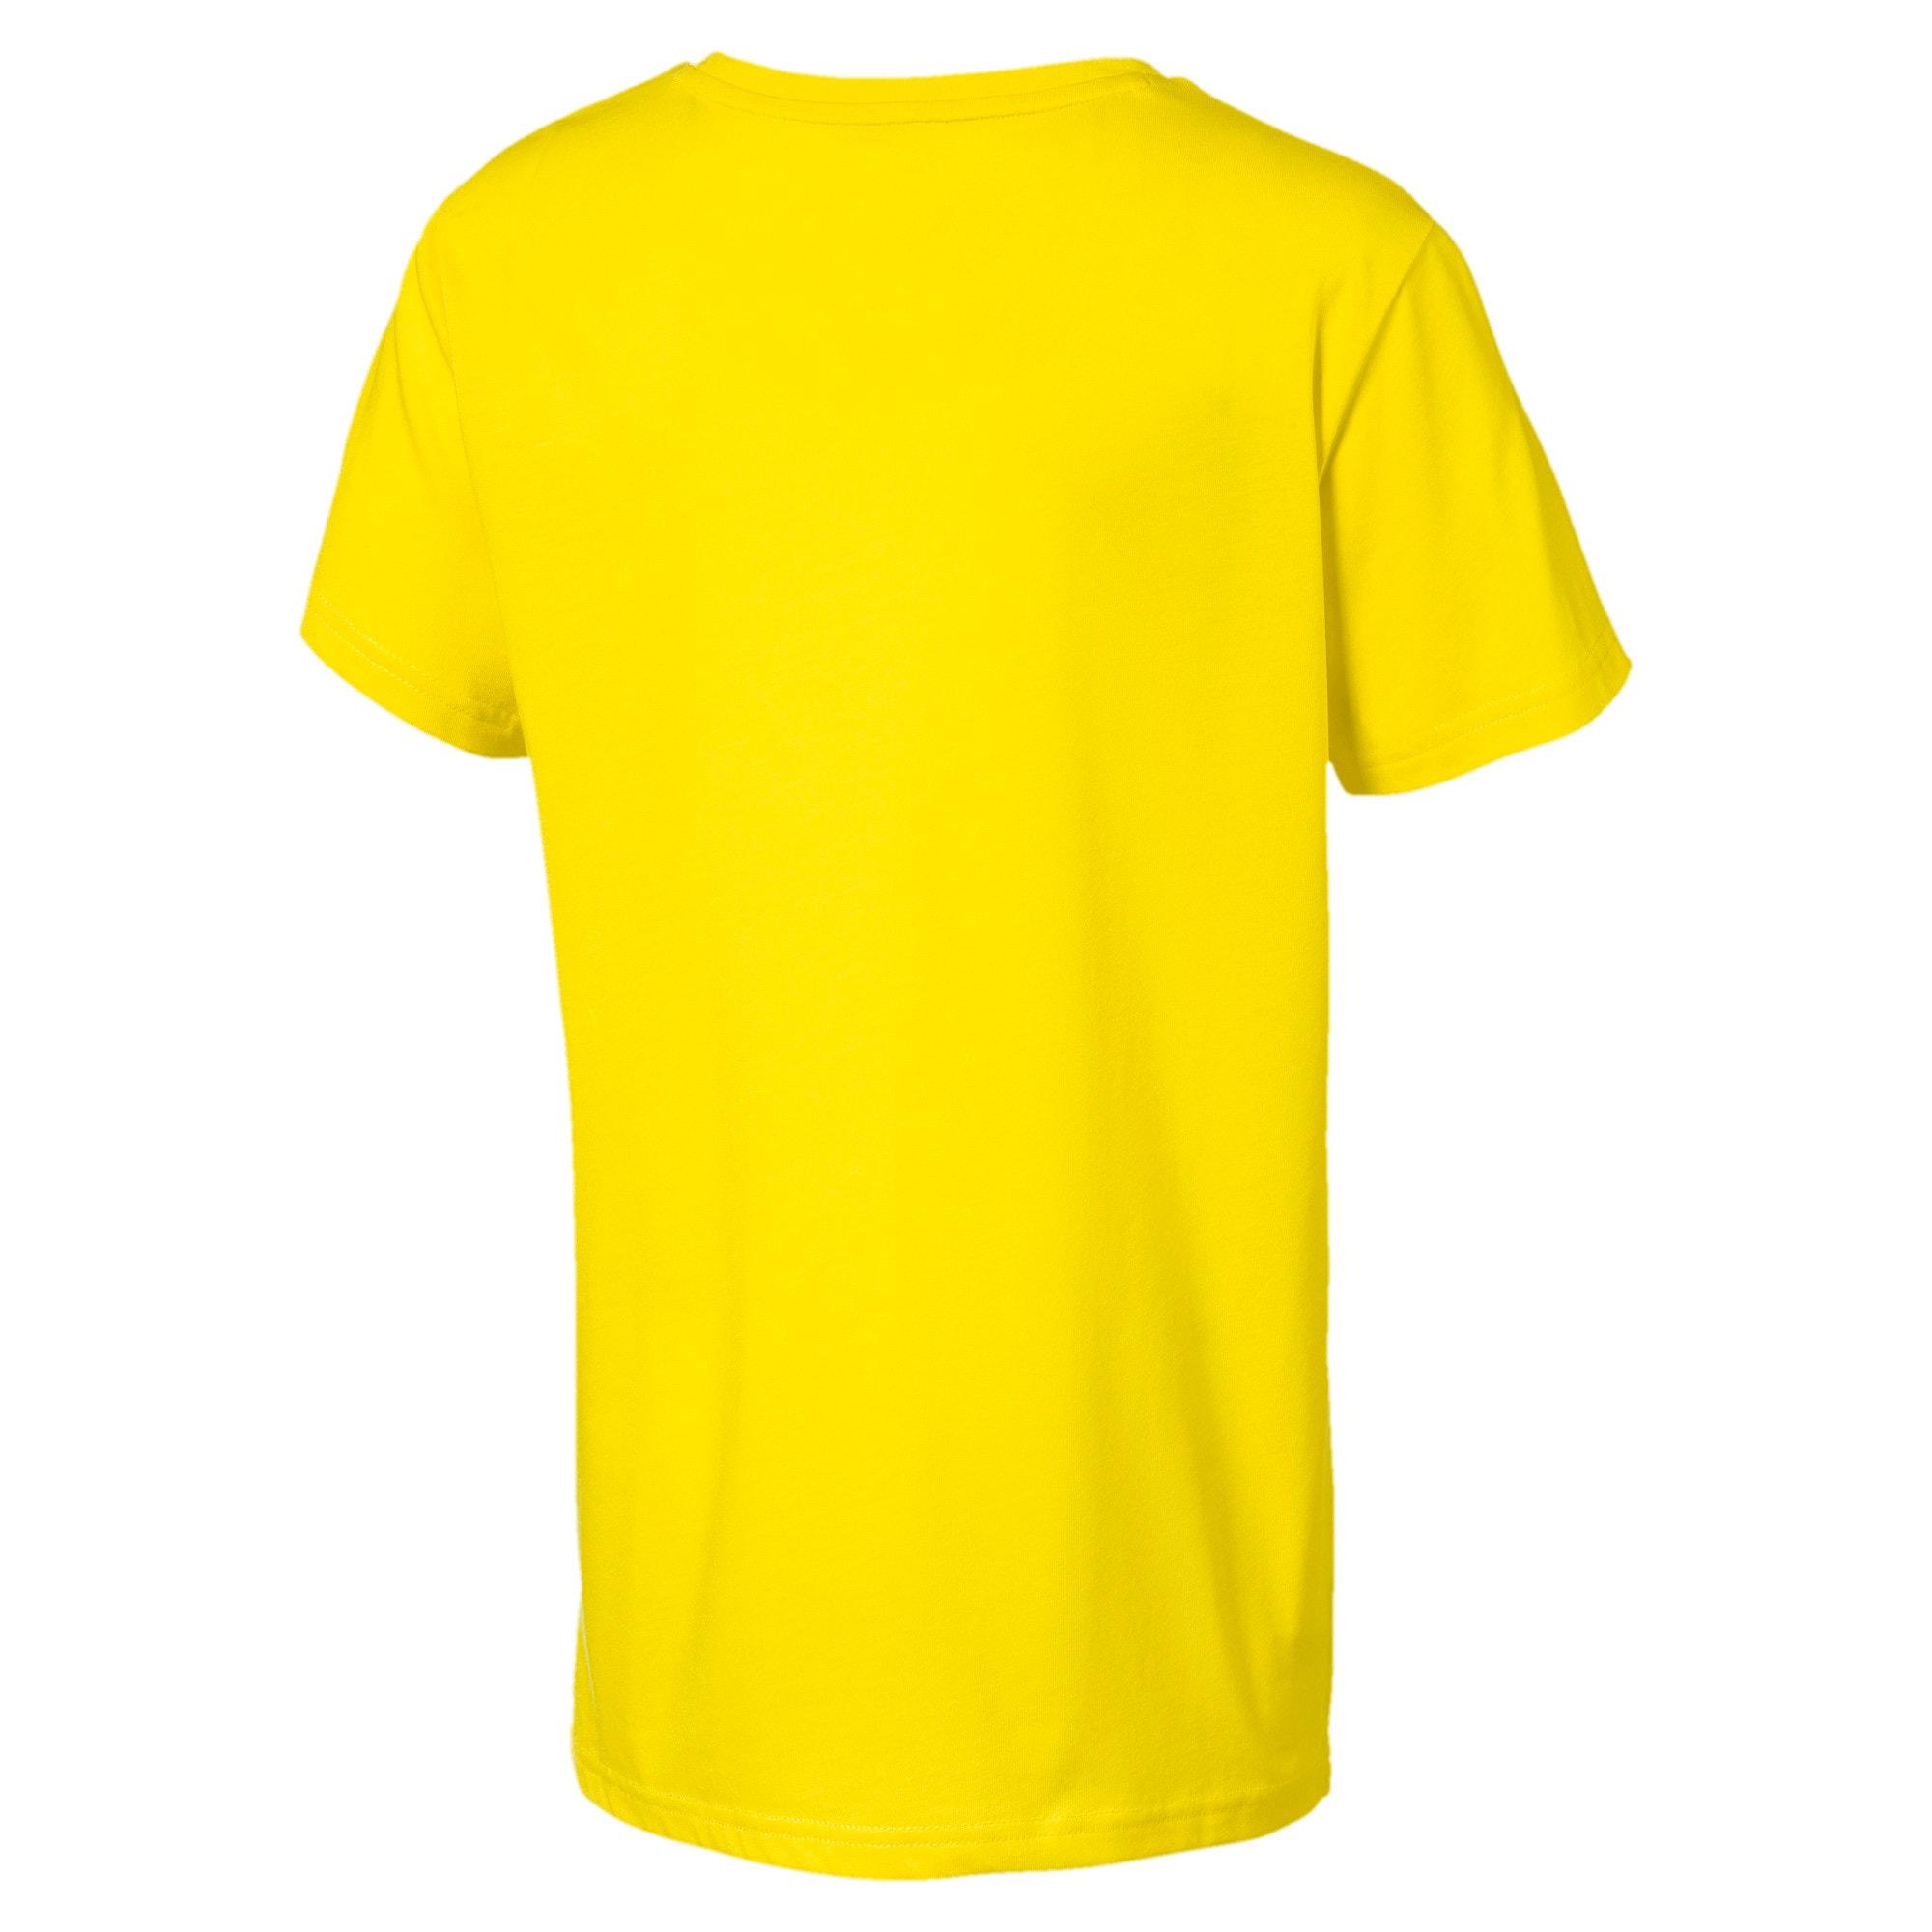 Thumbnail 1 of キッズ エナジー SS Tシャツ 半袖, Blazing Yellow, medium-JPN